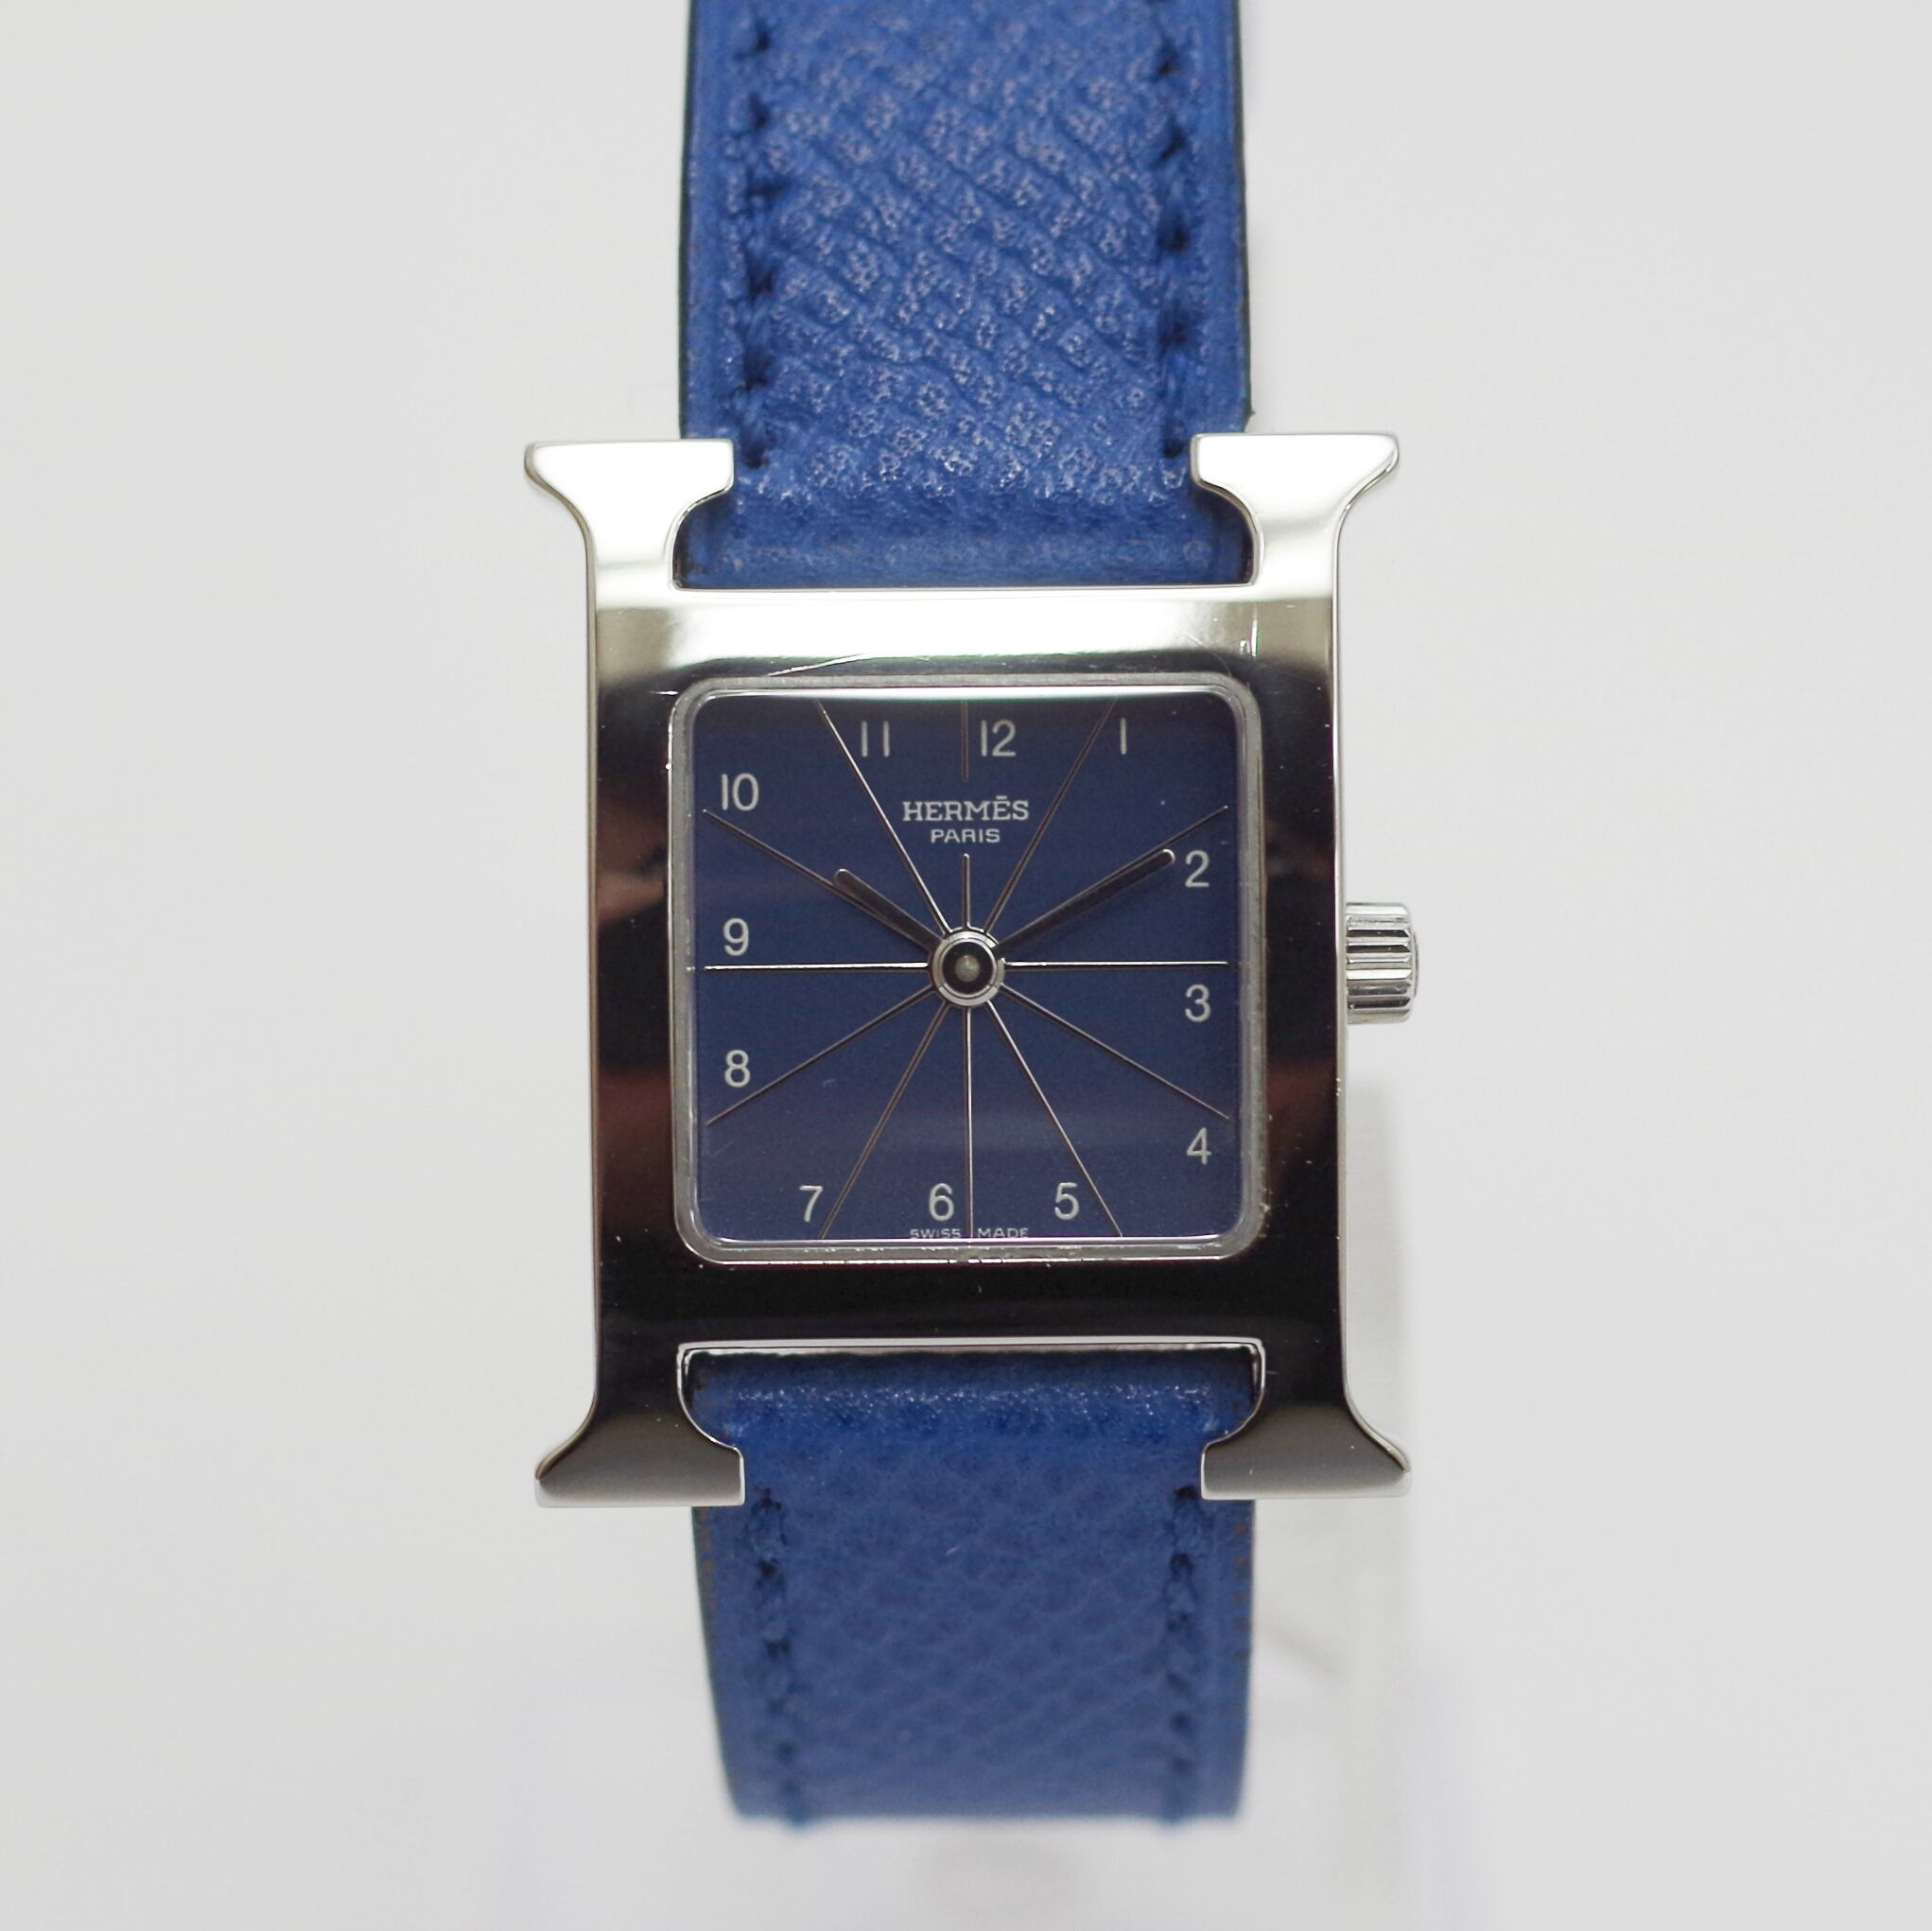 HERMES エルメス [HH1.210 H] クオーツ ブルー 革ベルト 腕時計 レディース